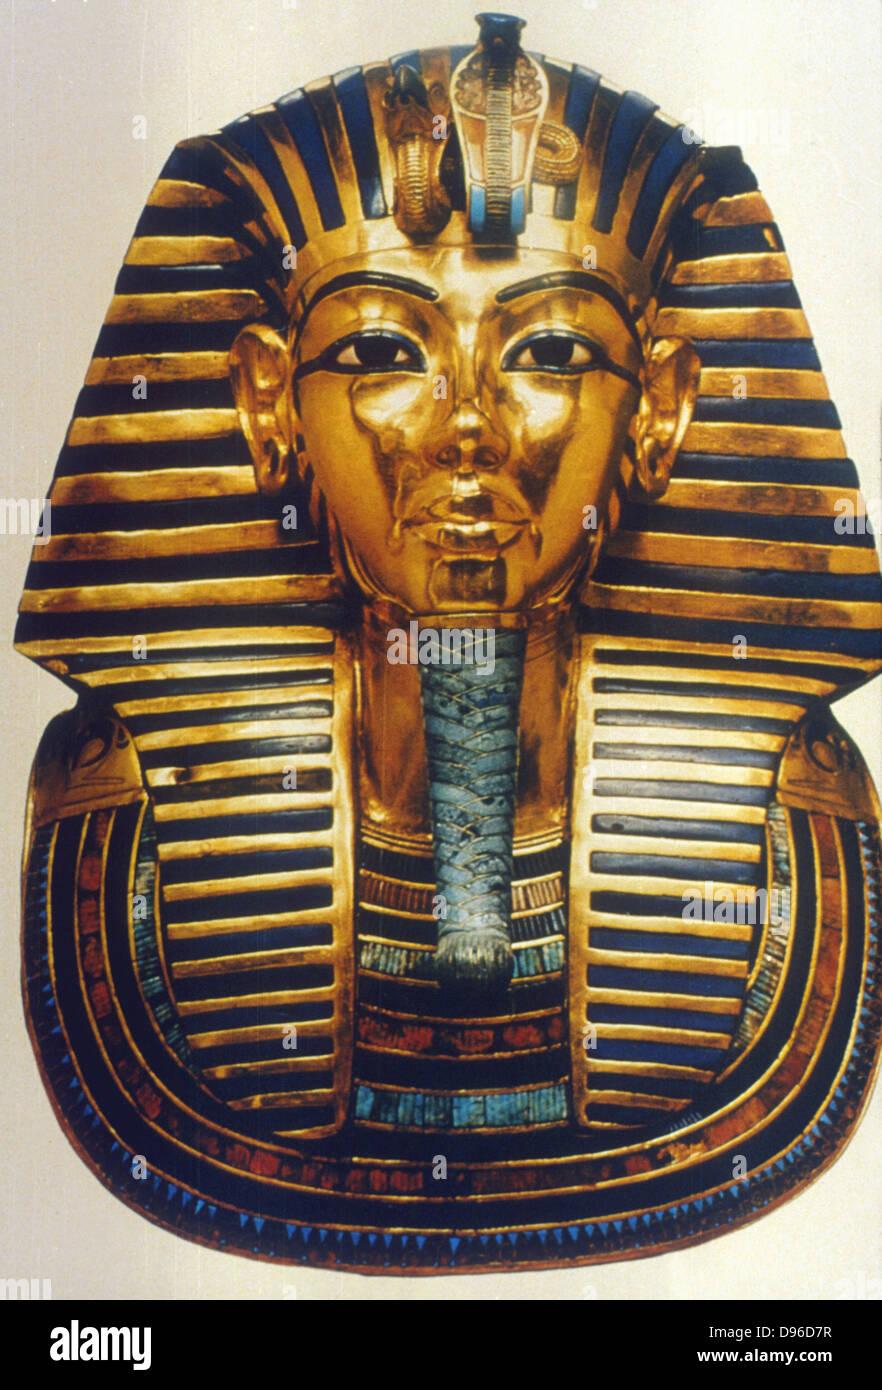 Tutankhamun (Tutankamen), king of Egypt, reigned 1361-1352 BC. 18th Dynasty. Gold and lapis lazuli funerary mask. - Stock Image